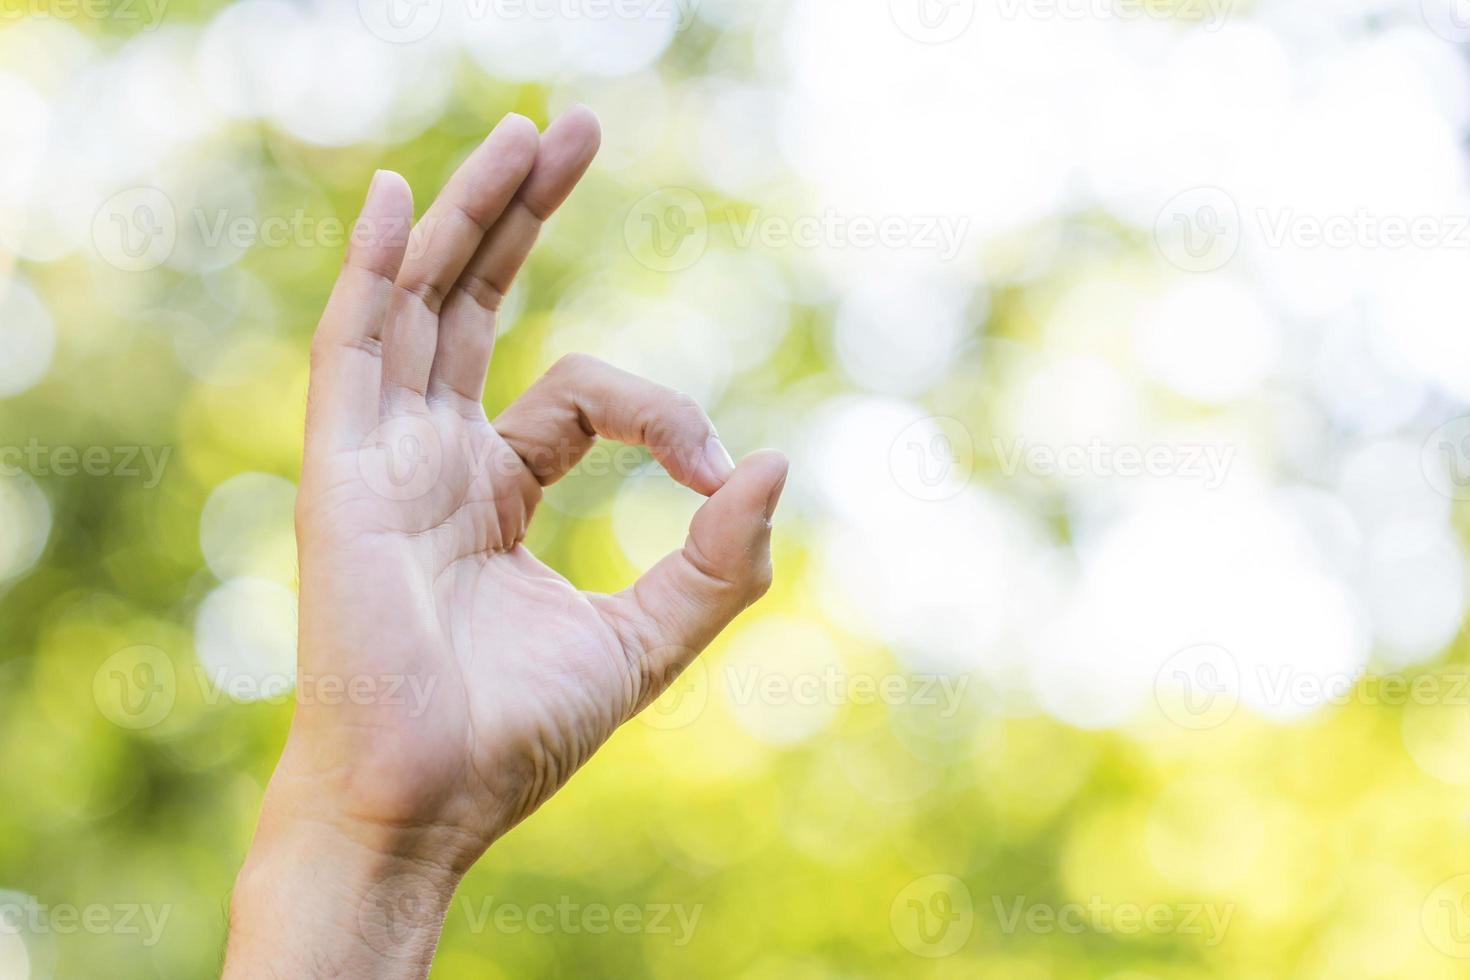 Man hand sign photo